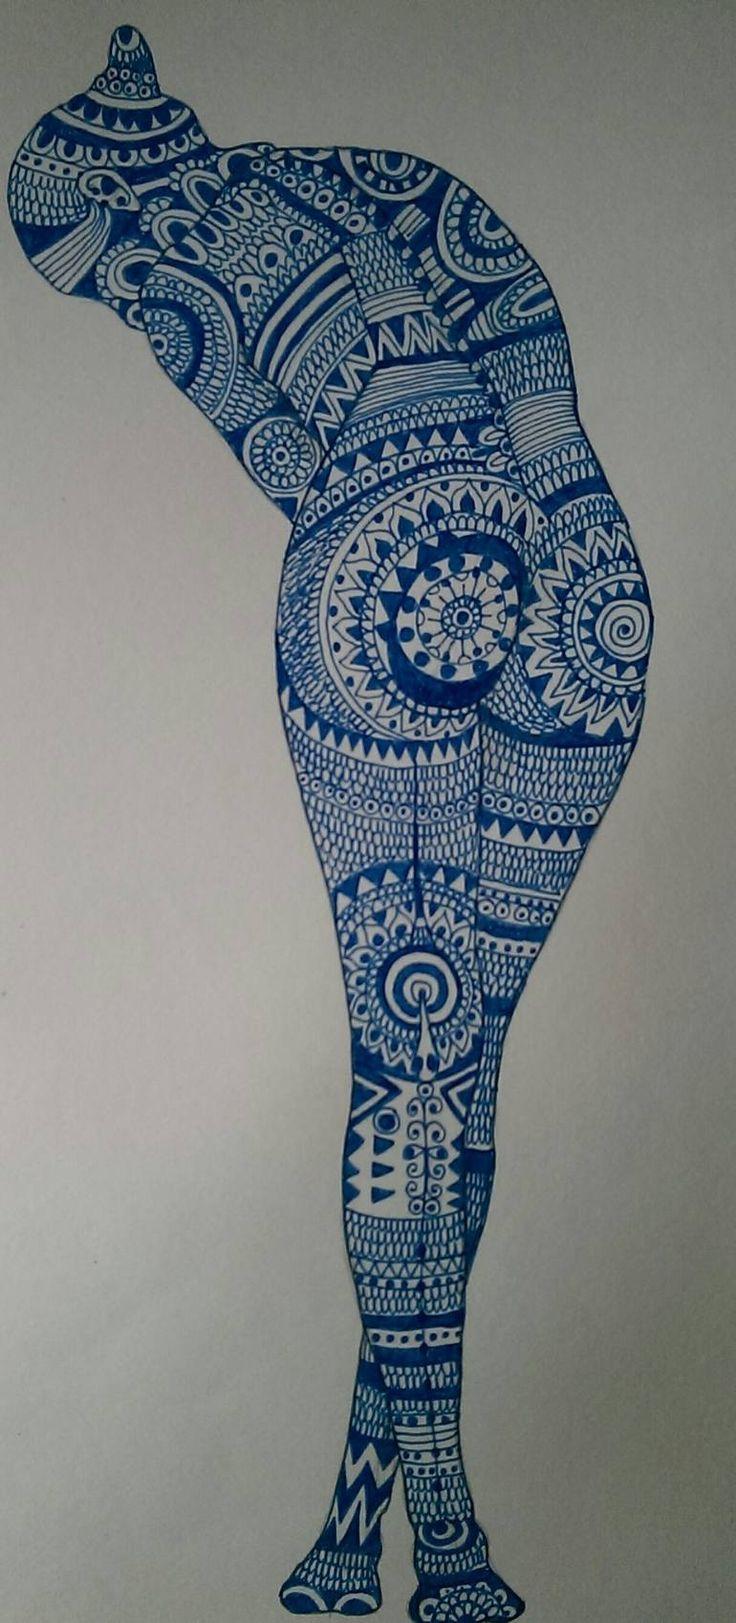 "Saatchi Art Artist Izabella Hornung; Drawing, ""Slow match nr 3 (Blue nude)"" #art"